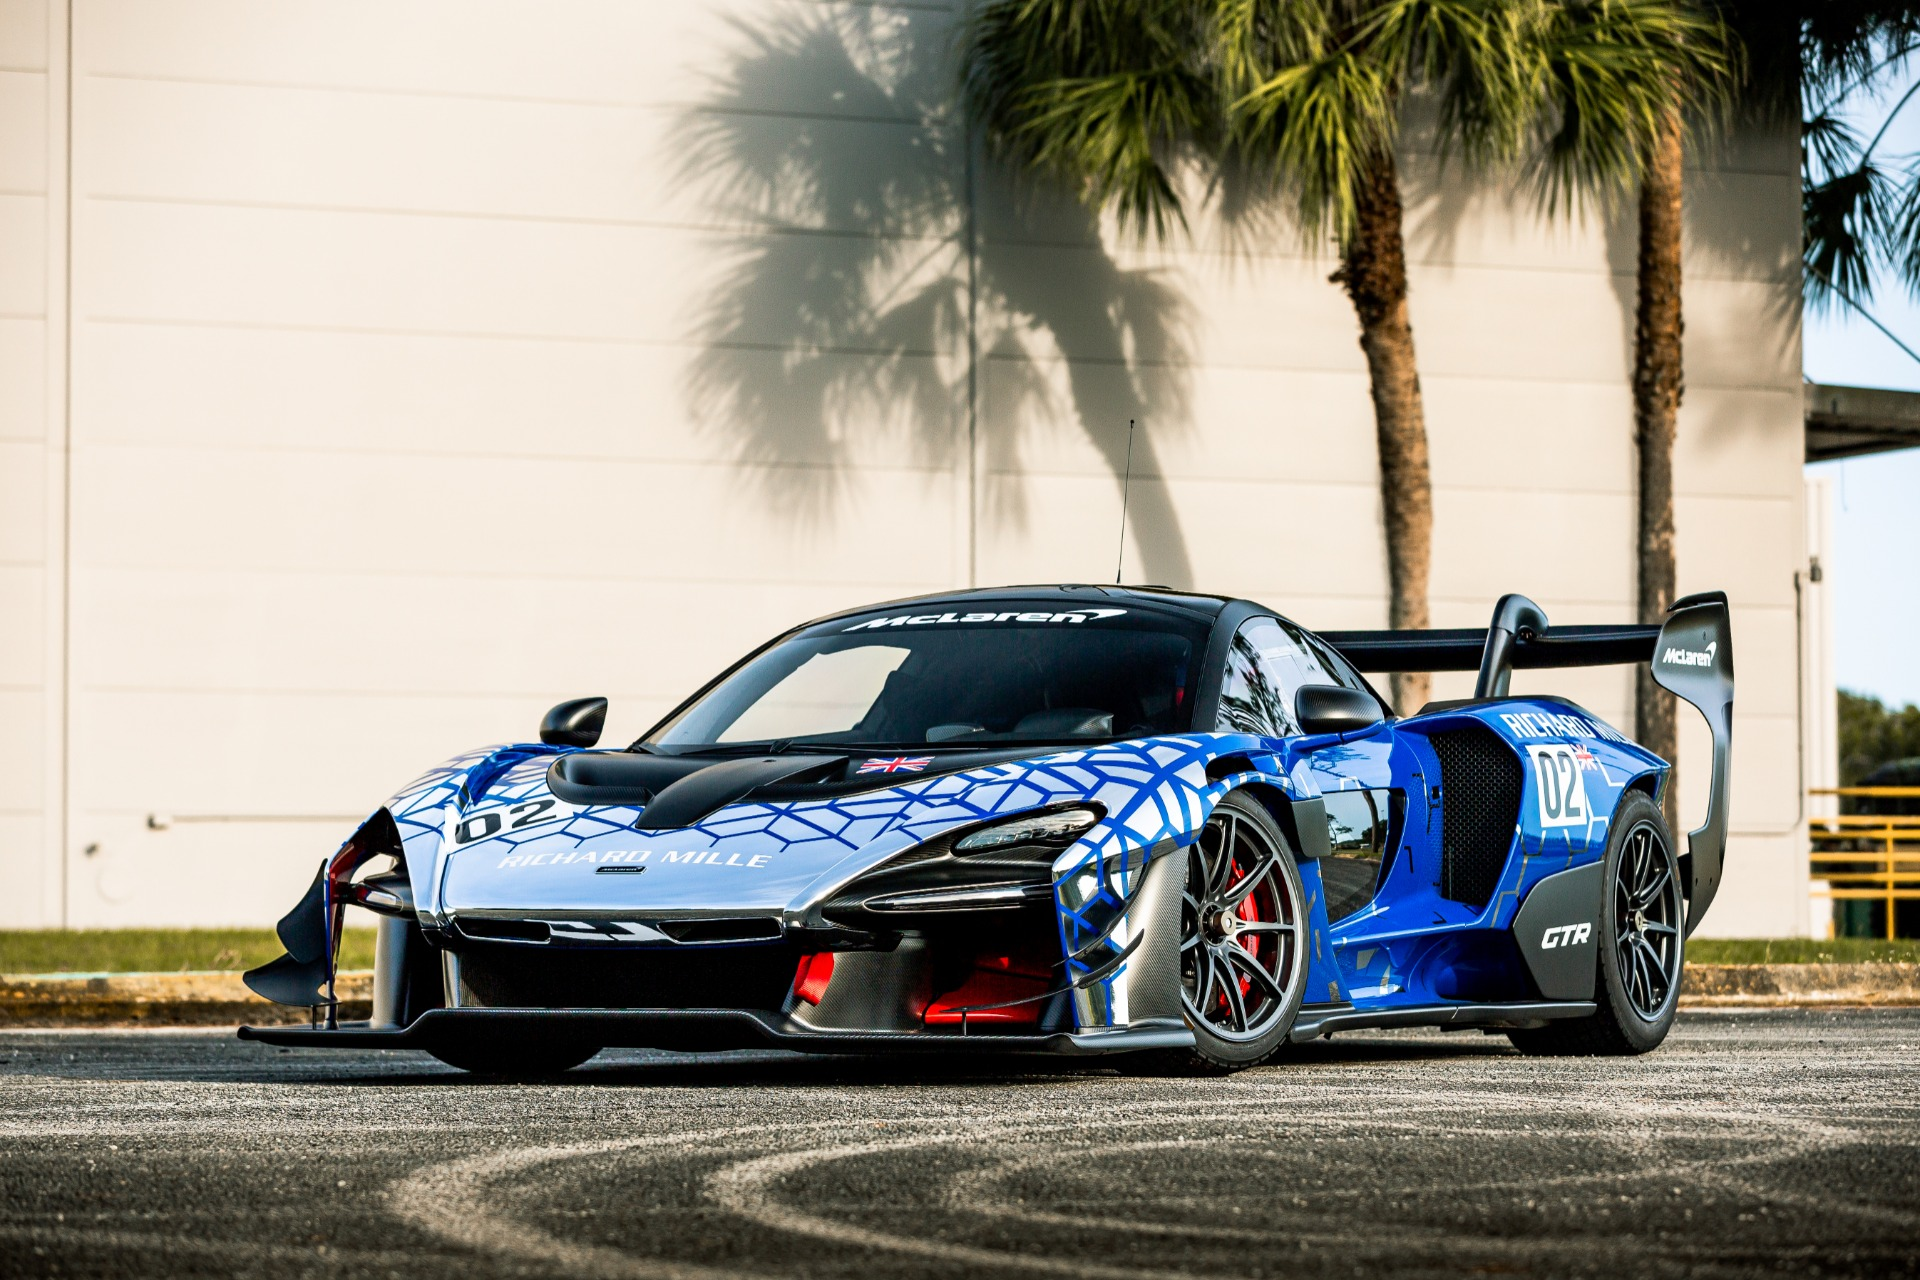 Used 2020 McLaren Senna GTR for sale Call for price at McLaren Orlando LLC in Titusville FL 32780 1